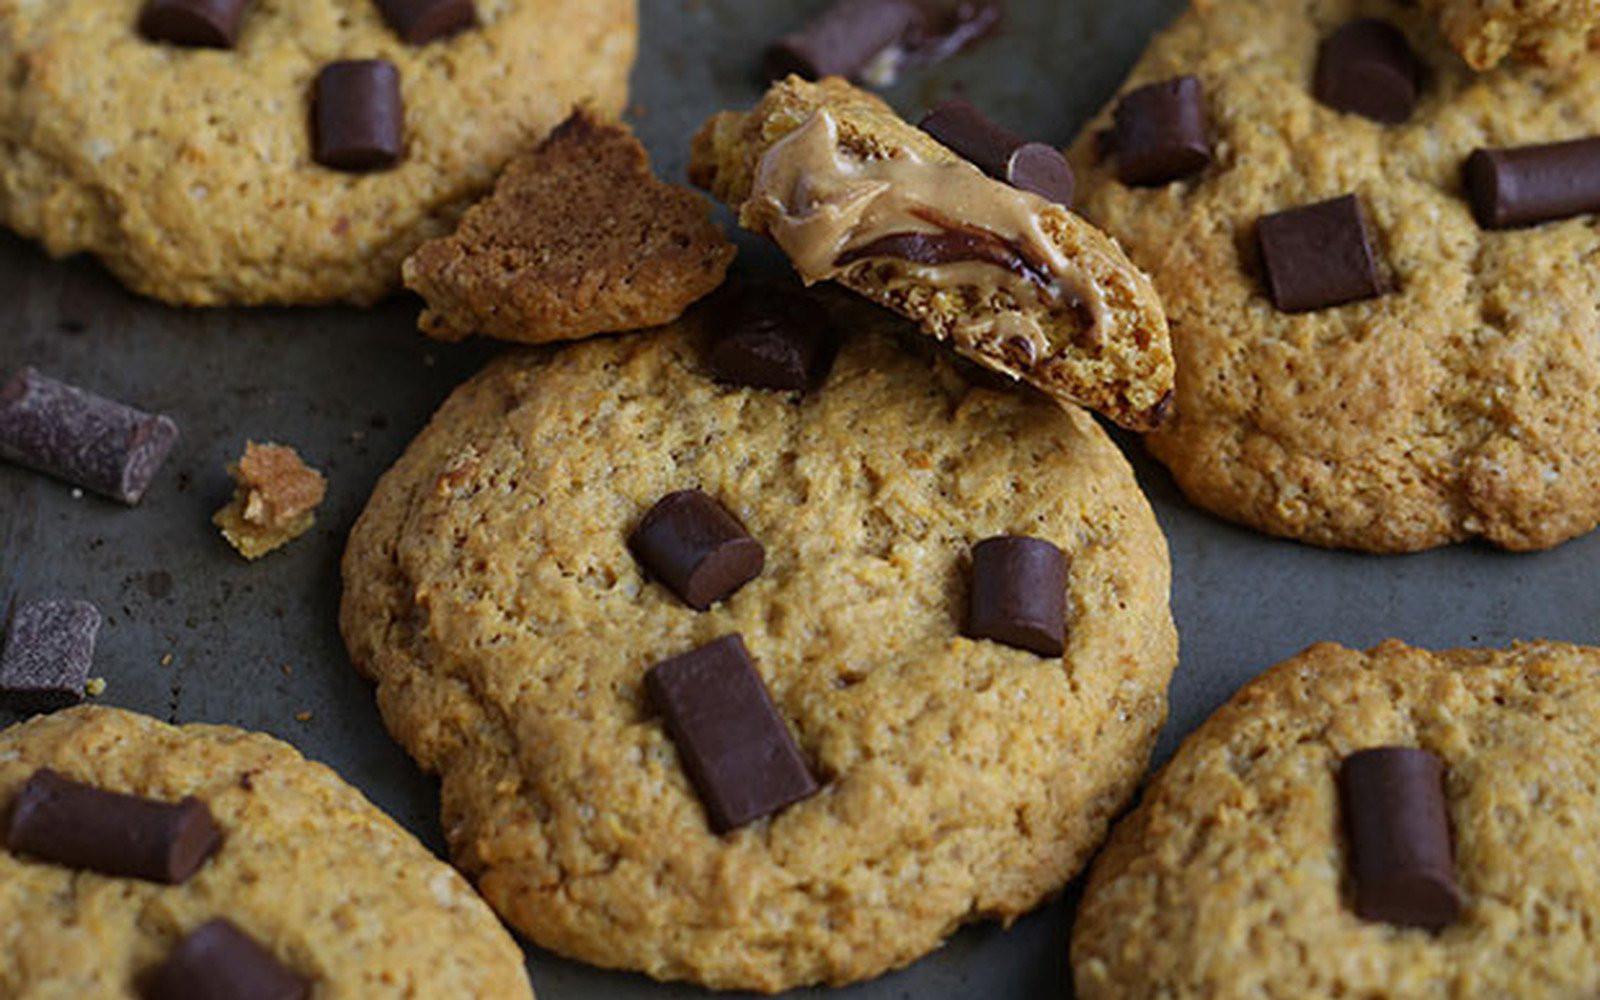 pb stuffed cookies